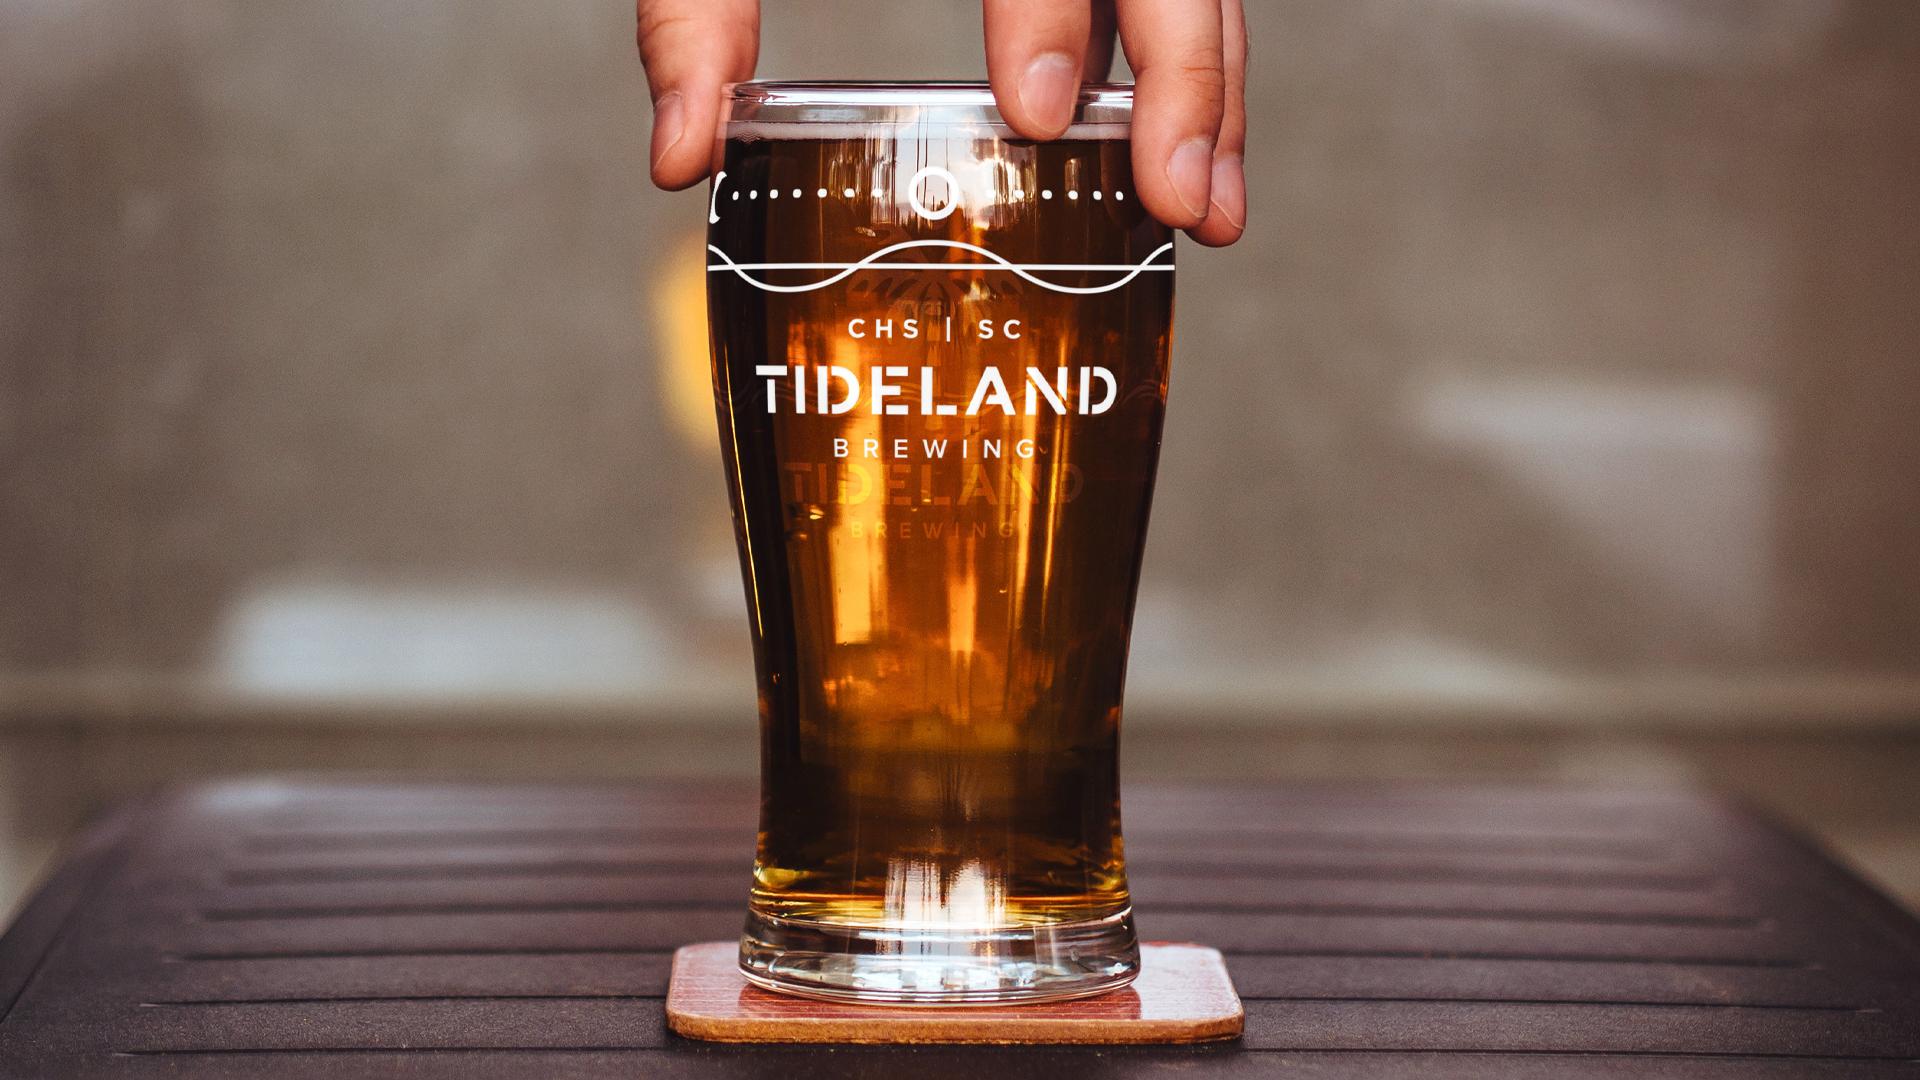 Tideland Brewing Pint Glass